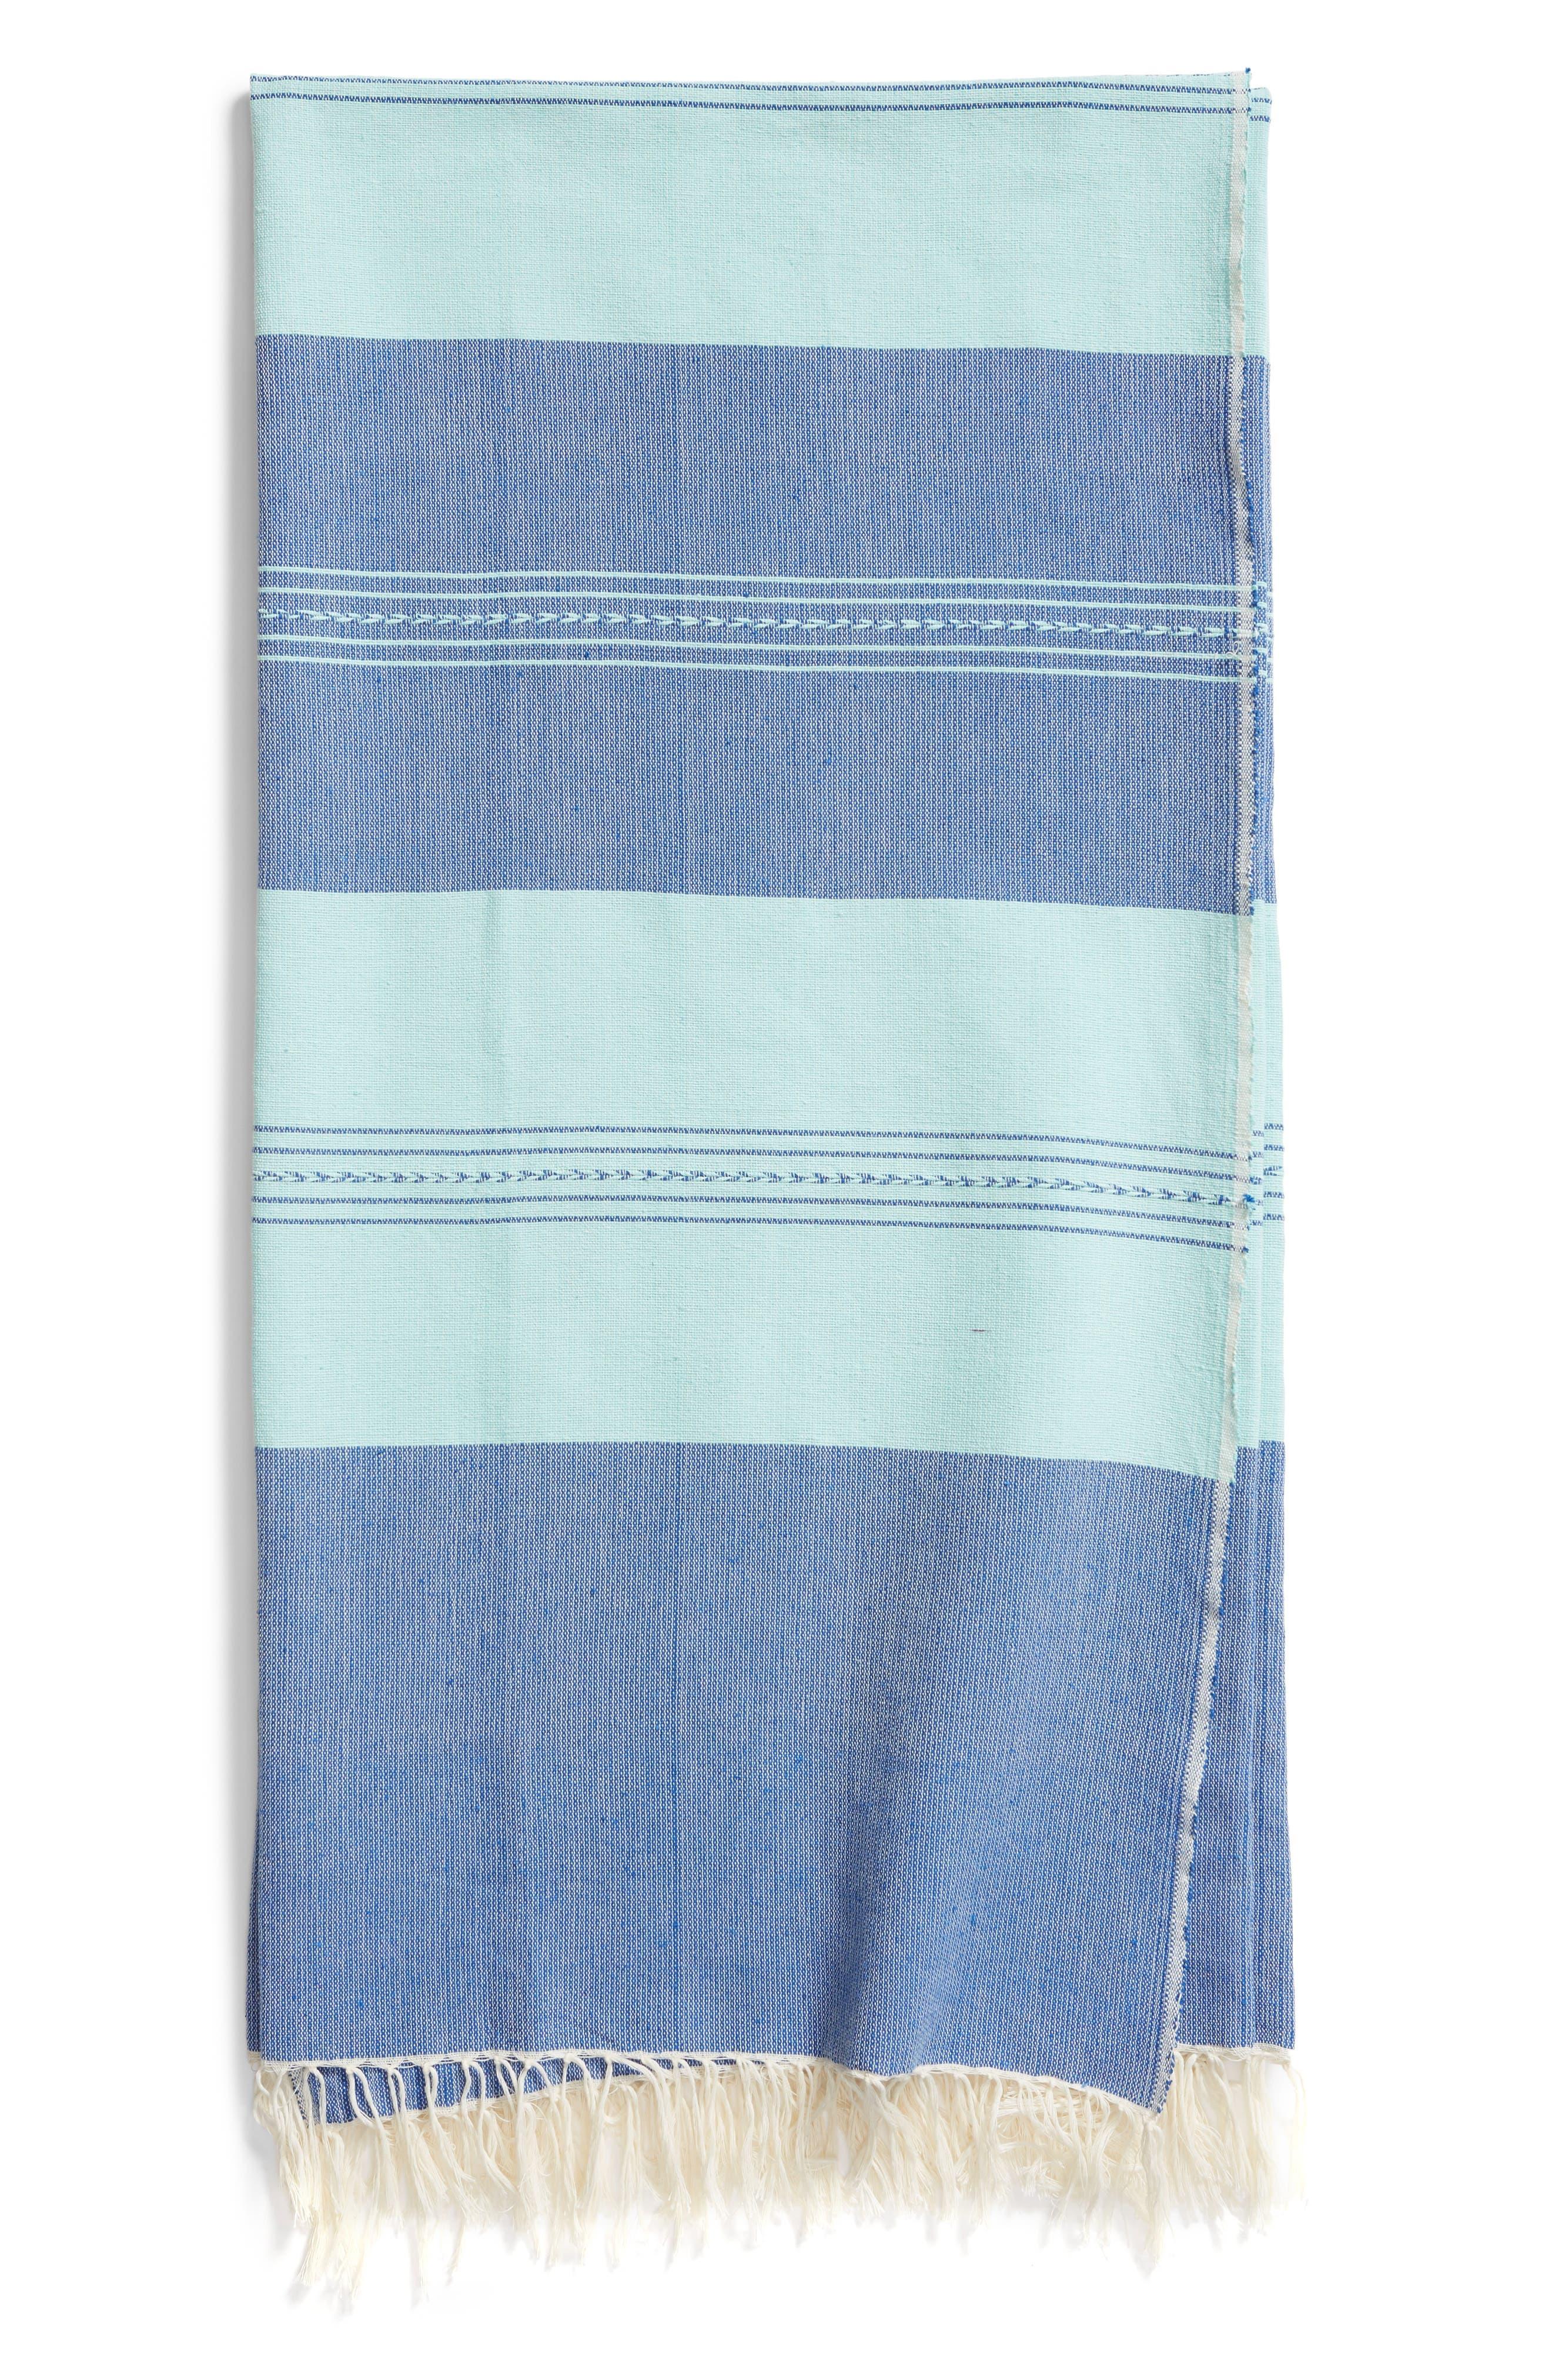 Aegean Sea Woven Cotton Blanket,                         Main,                         color, GREEN/BLUE